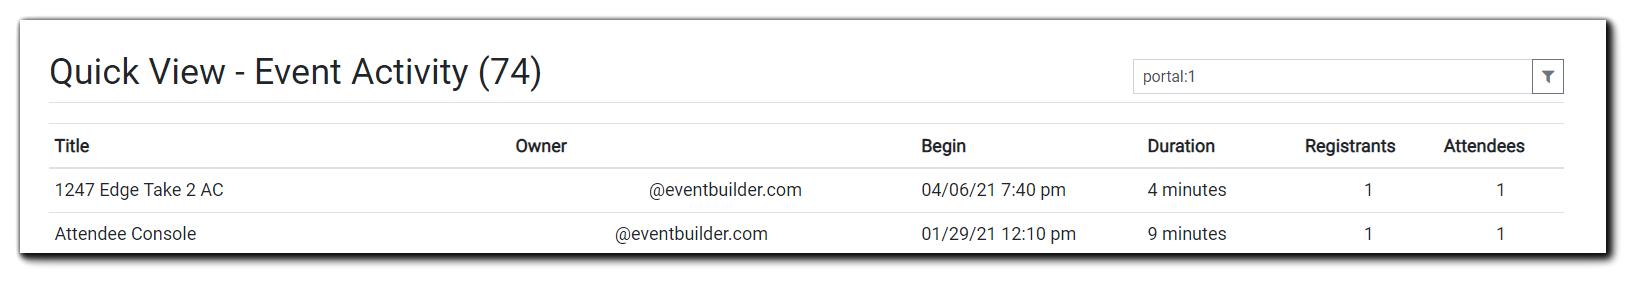 Screenshot: Quick View - Event Activity Report information.